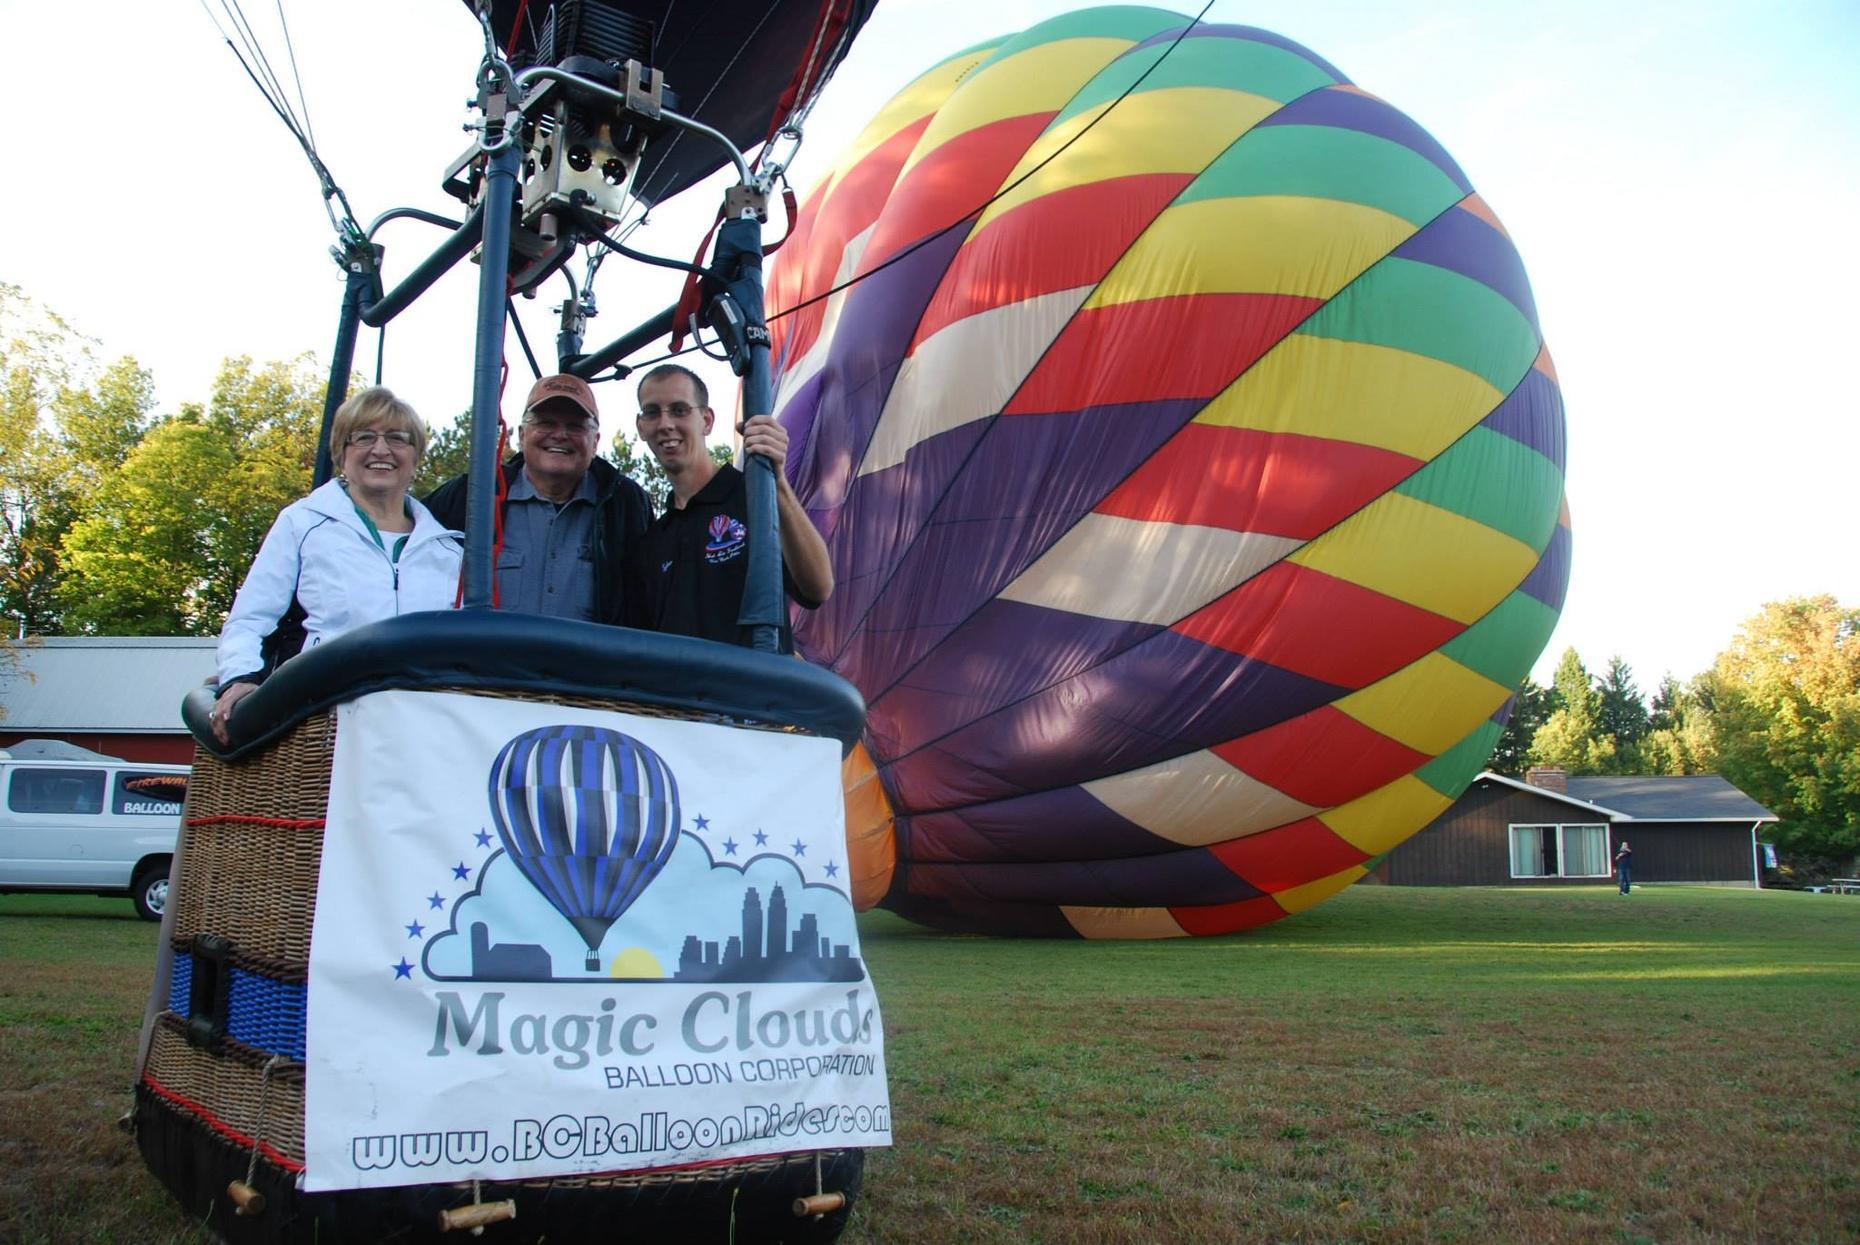 Hot Air Balloon Ride in Battle Creek